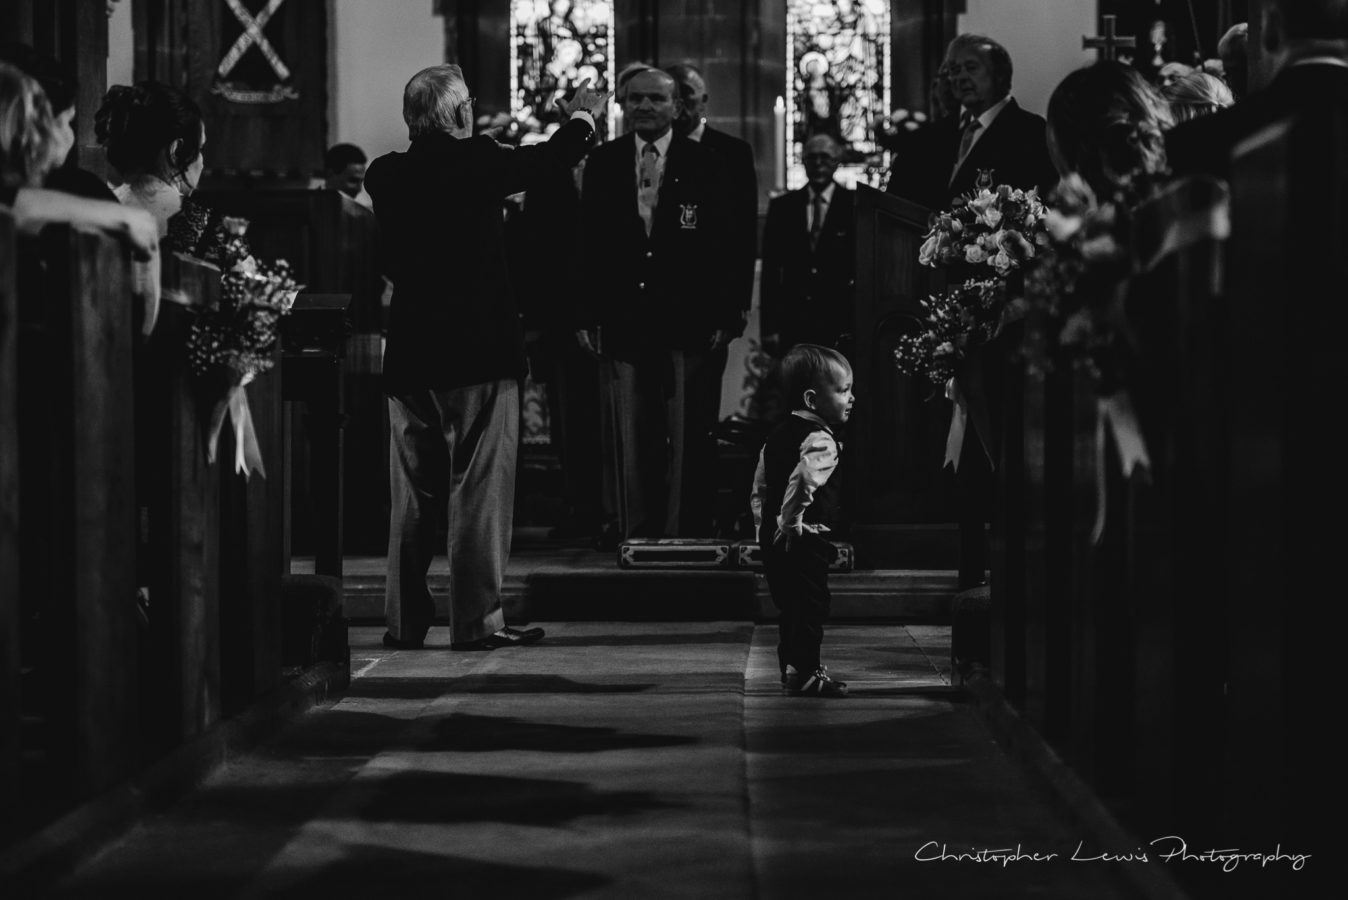 Thief-Hall-Wedding-Christopher-Lewis-Photography-27